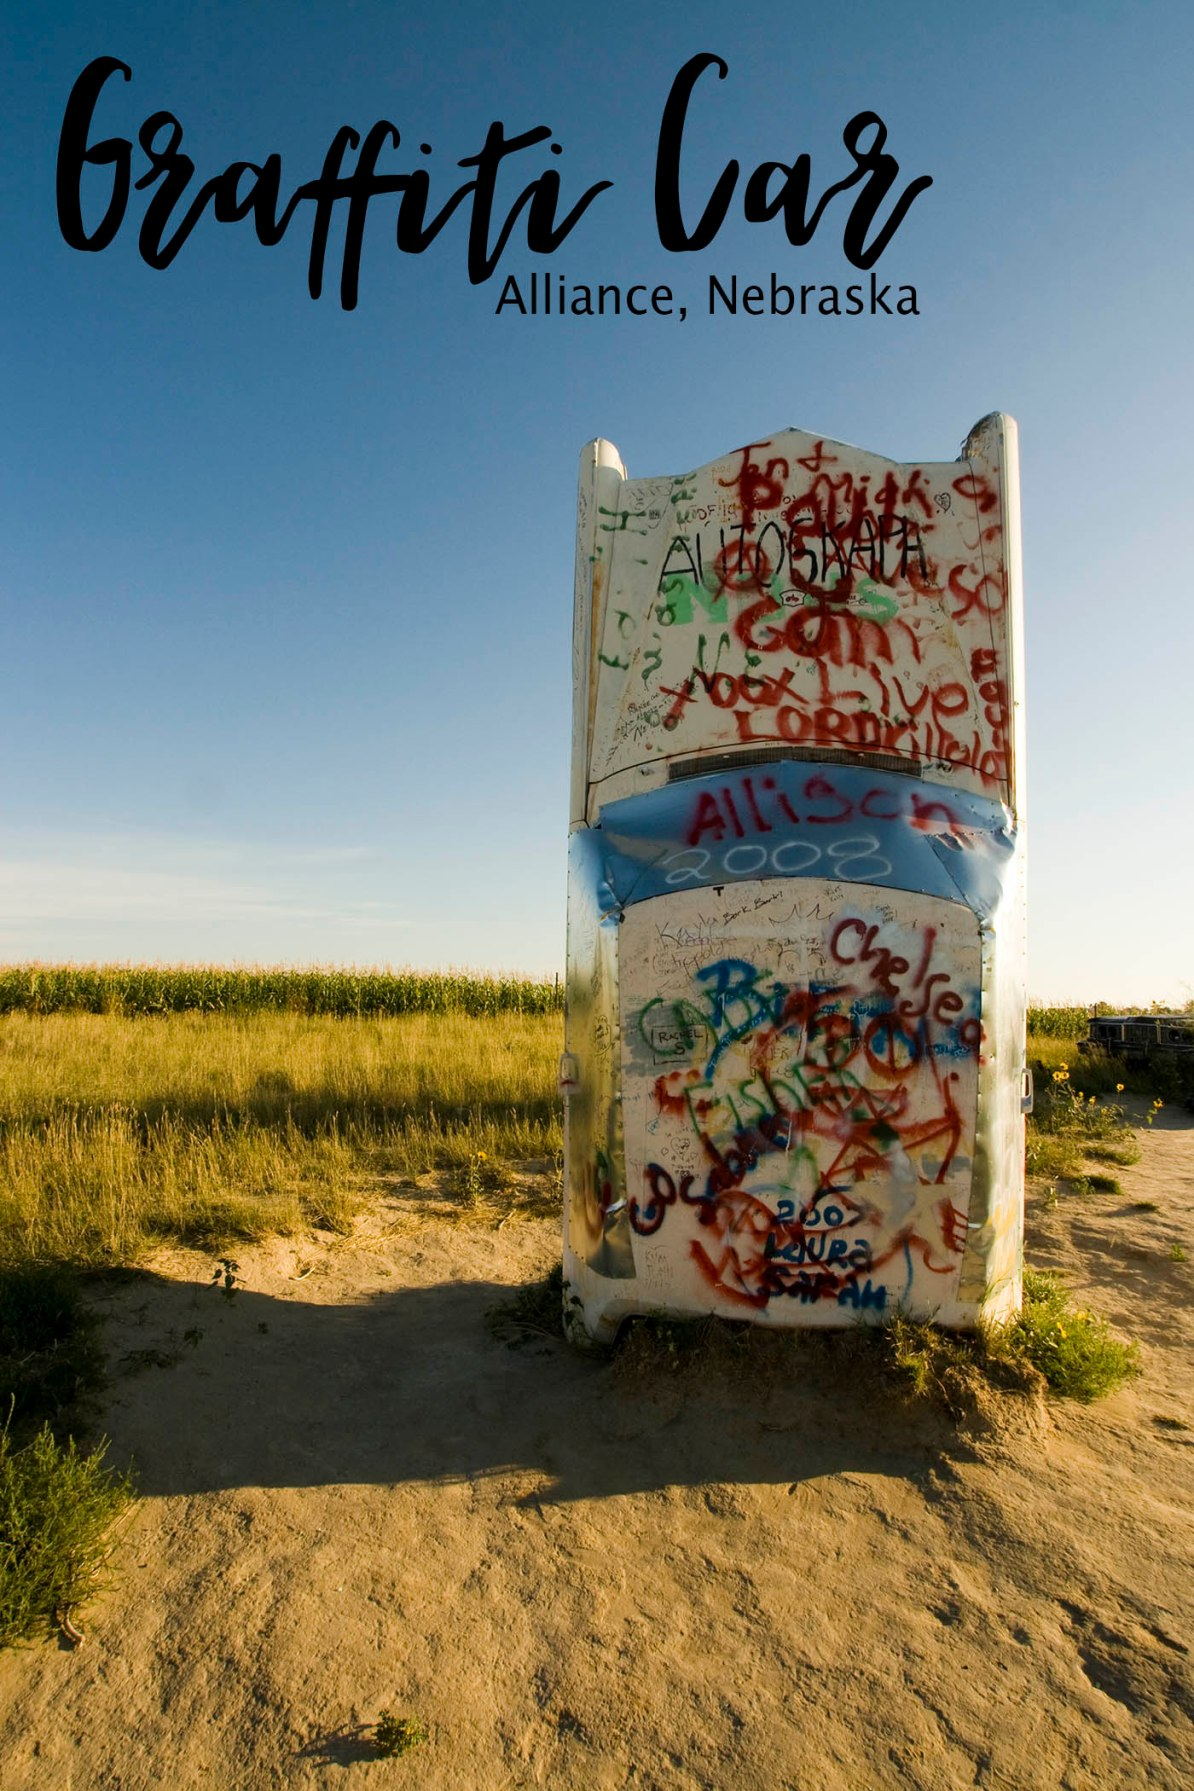 Graffiti car at Carhenge roadside attraction in Alliance, Nebraska